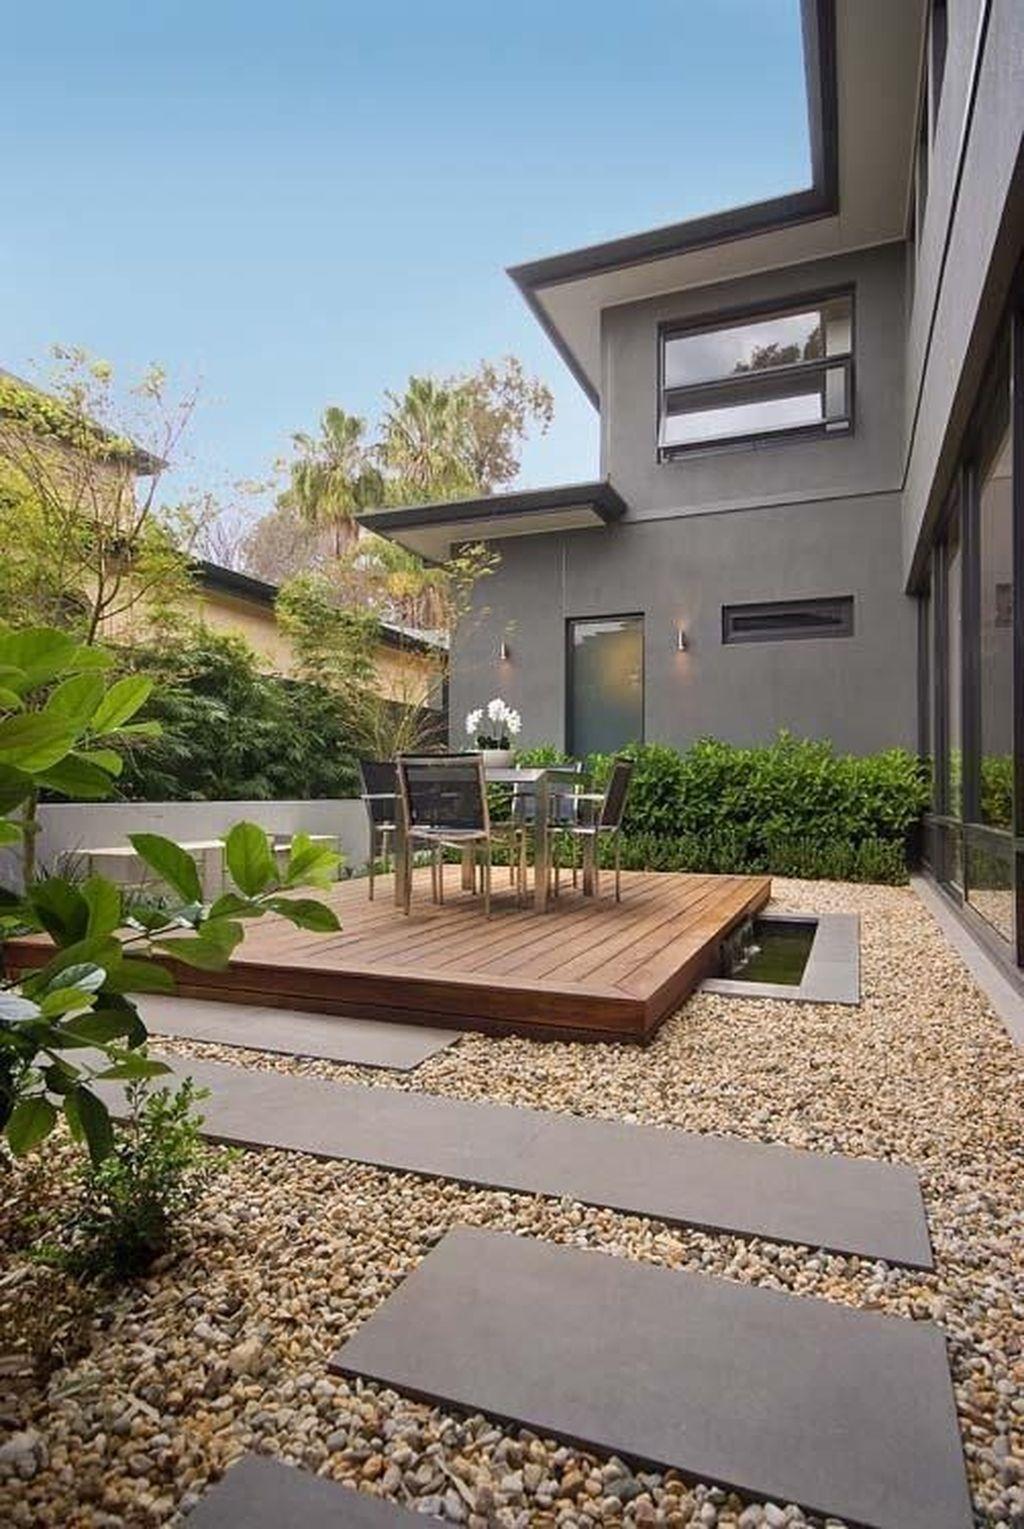 Brilliant Small Backyard Design Ideas On A Budget 25